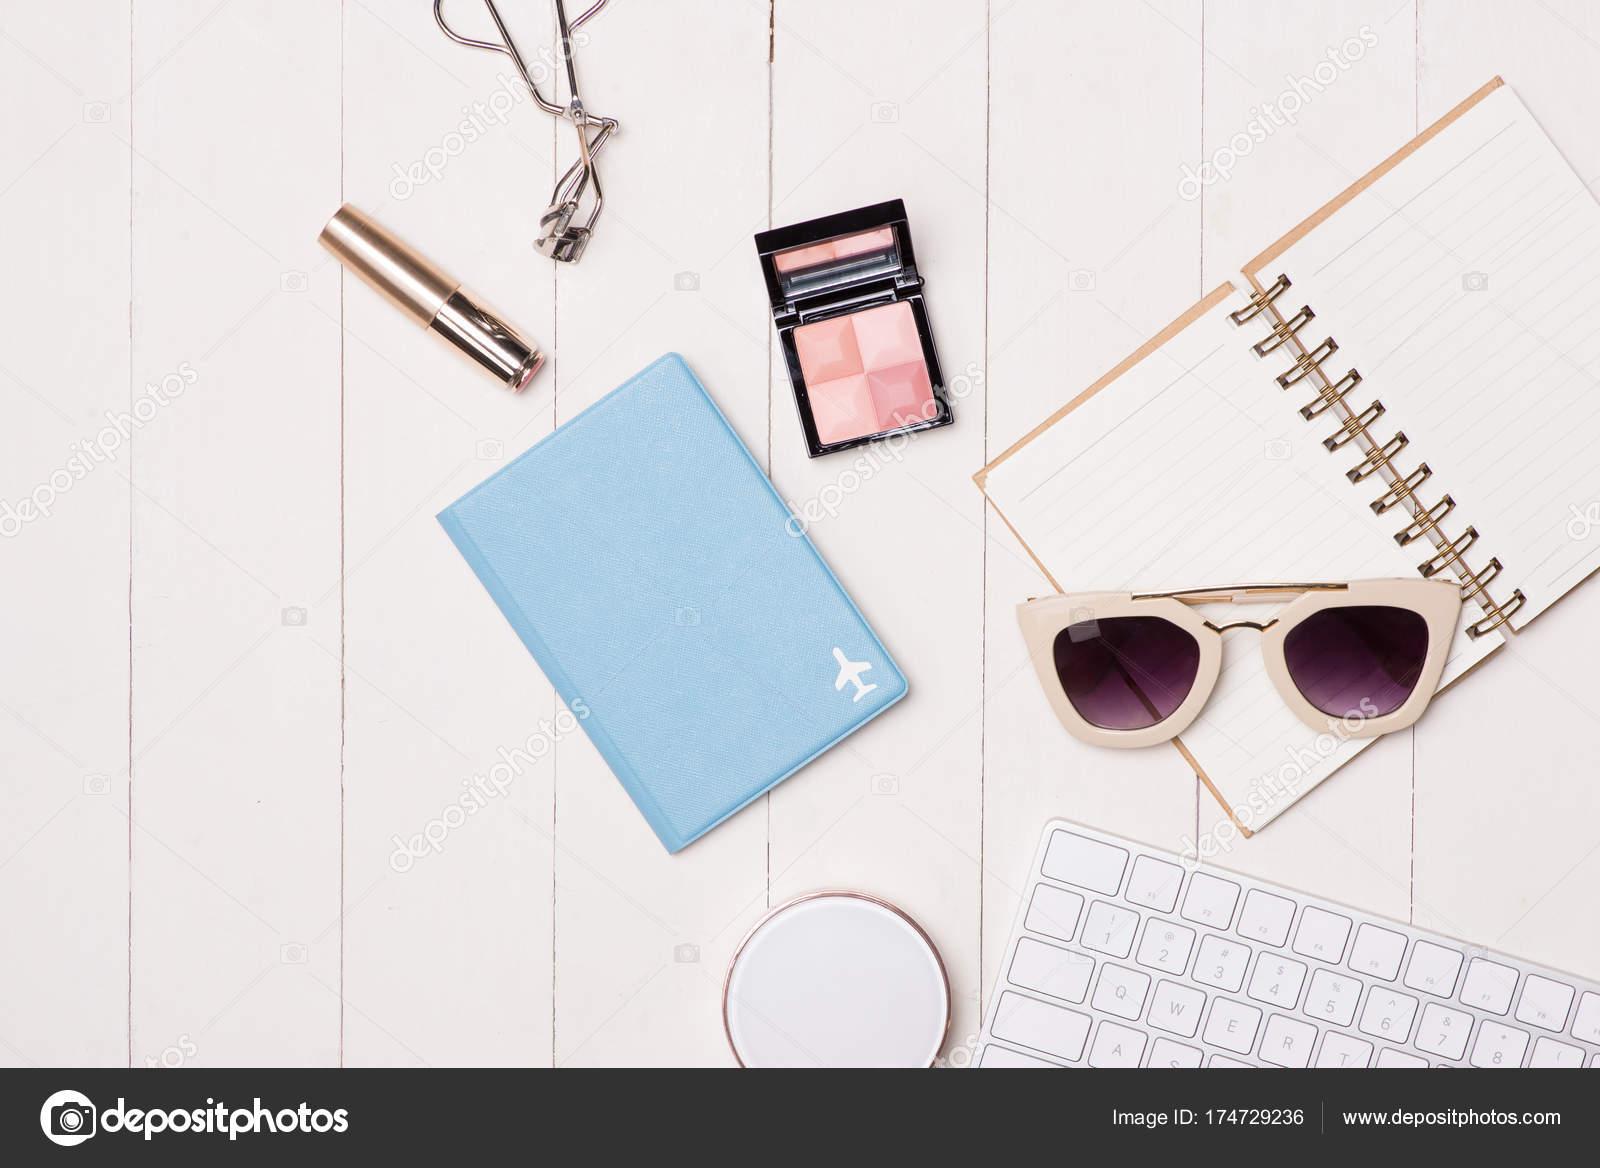 8401262db1f Women Cosmetics Fashion Items Table Camera Passport Top View — Stock ...